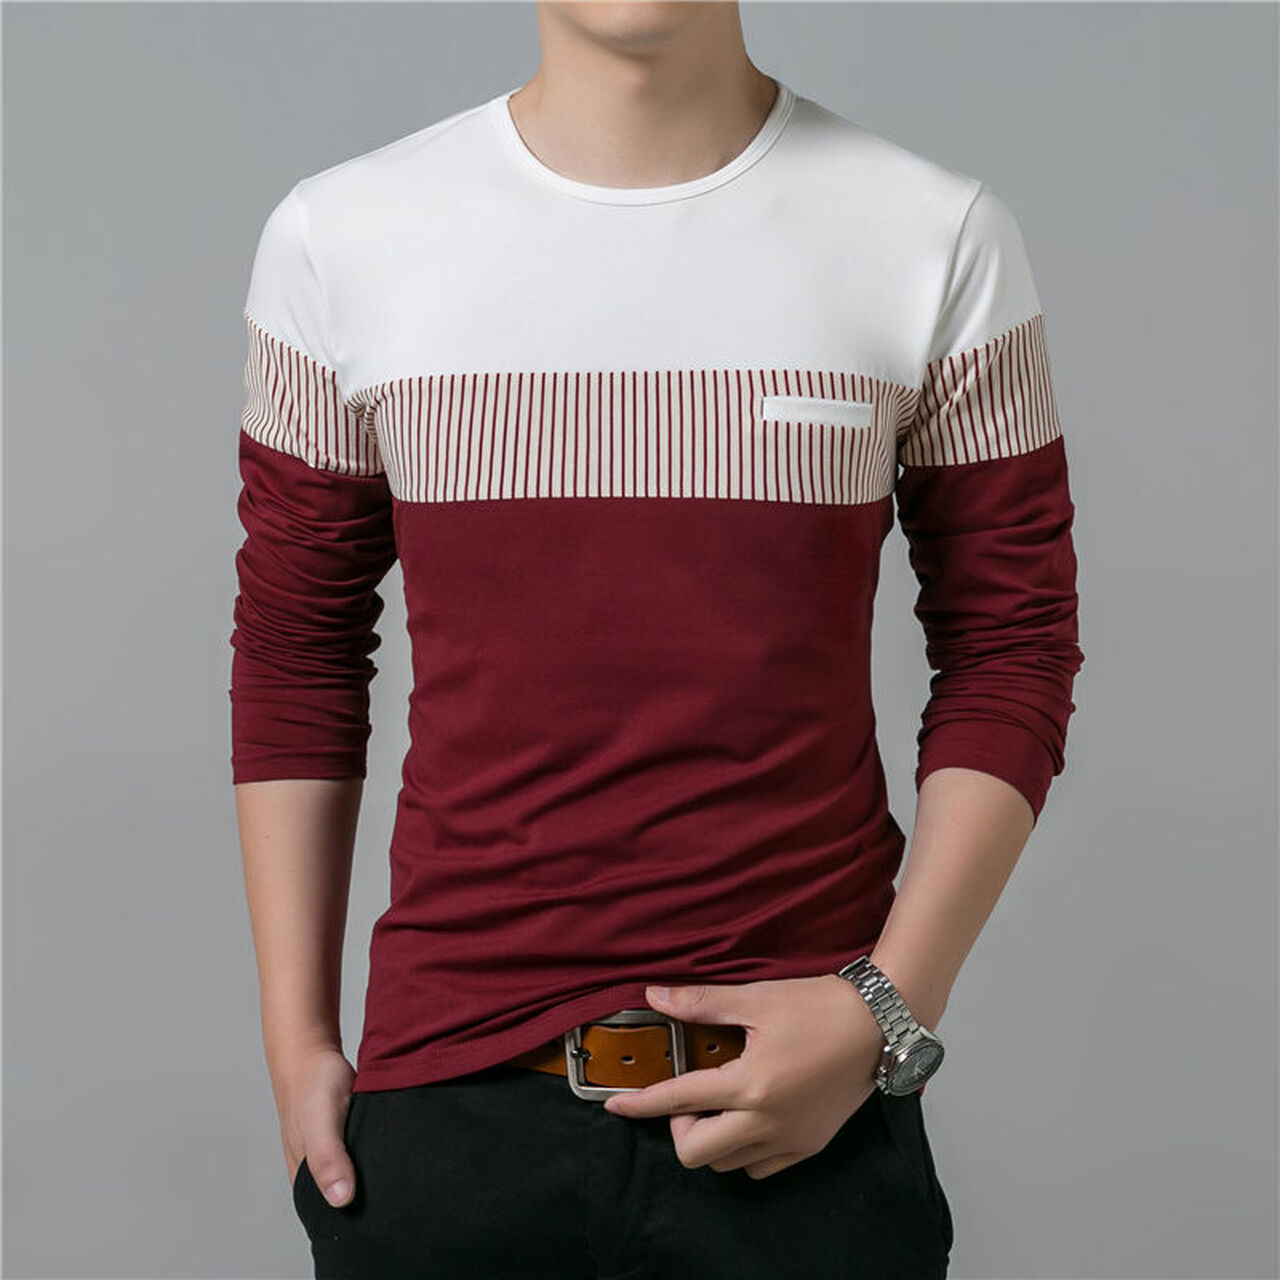 ... T-Shirt Men 2018 Spring Summer New Long Sleeve O-Neck T Shirt Men ... 7deb5d93083